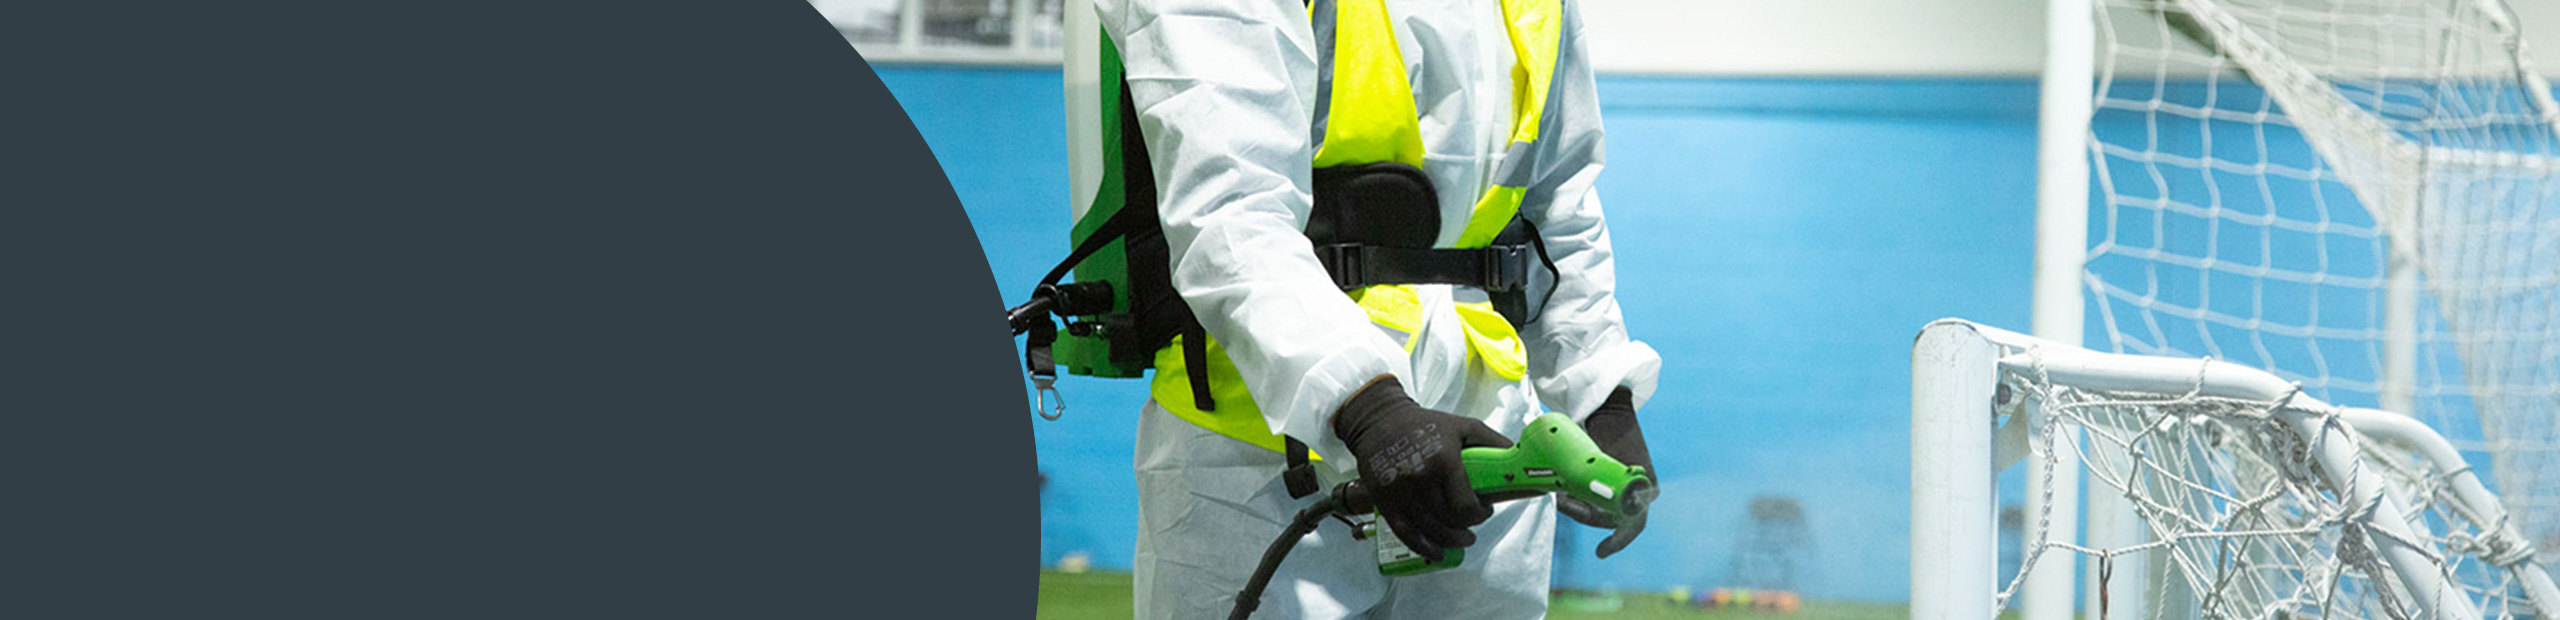 London Stadium Cleaning